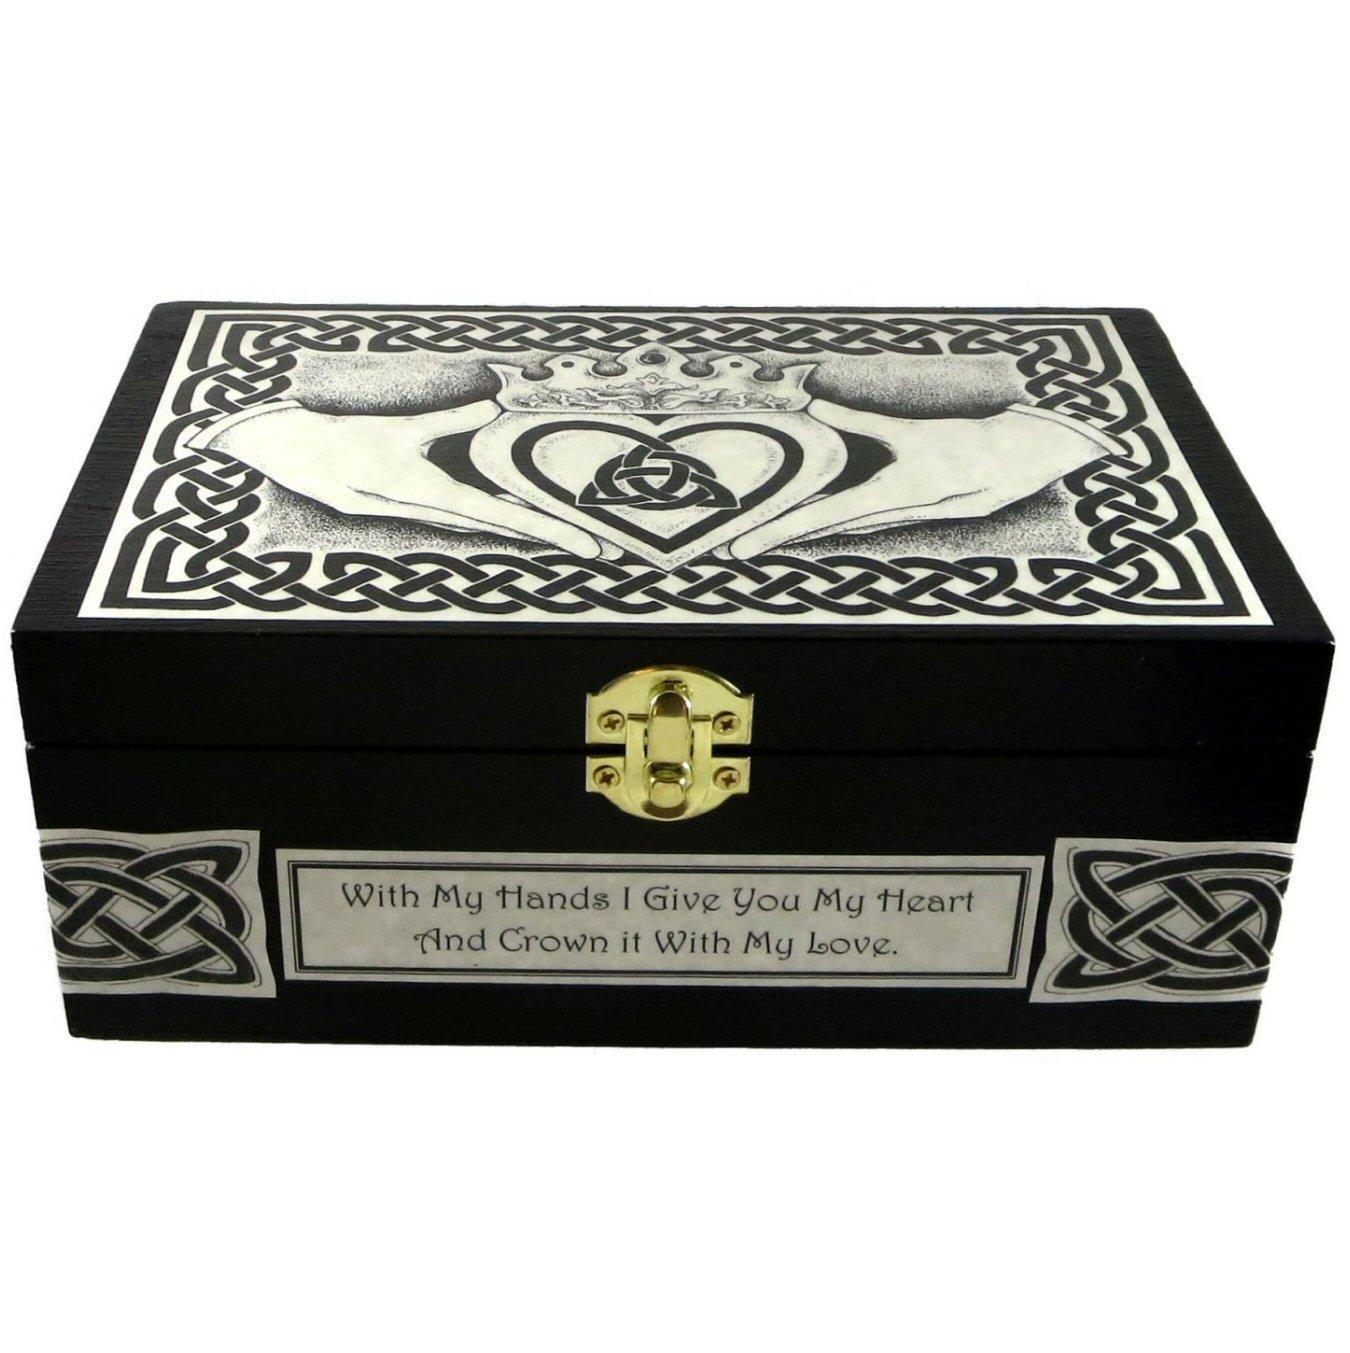 B015GQYK5I Celtic Claddagh Wooden Box with Custom Message by Dragon Star Creations LRB2995C 713CWdj009L